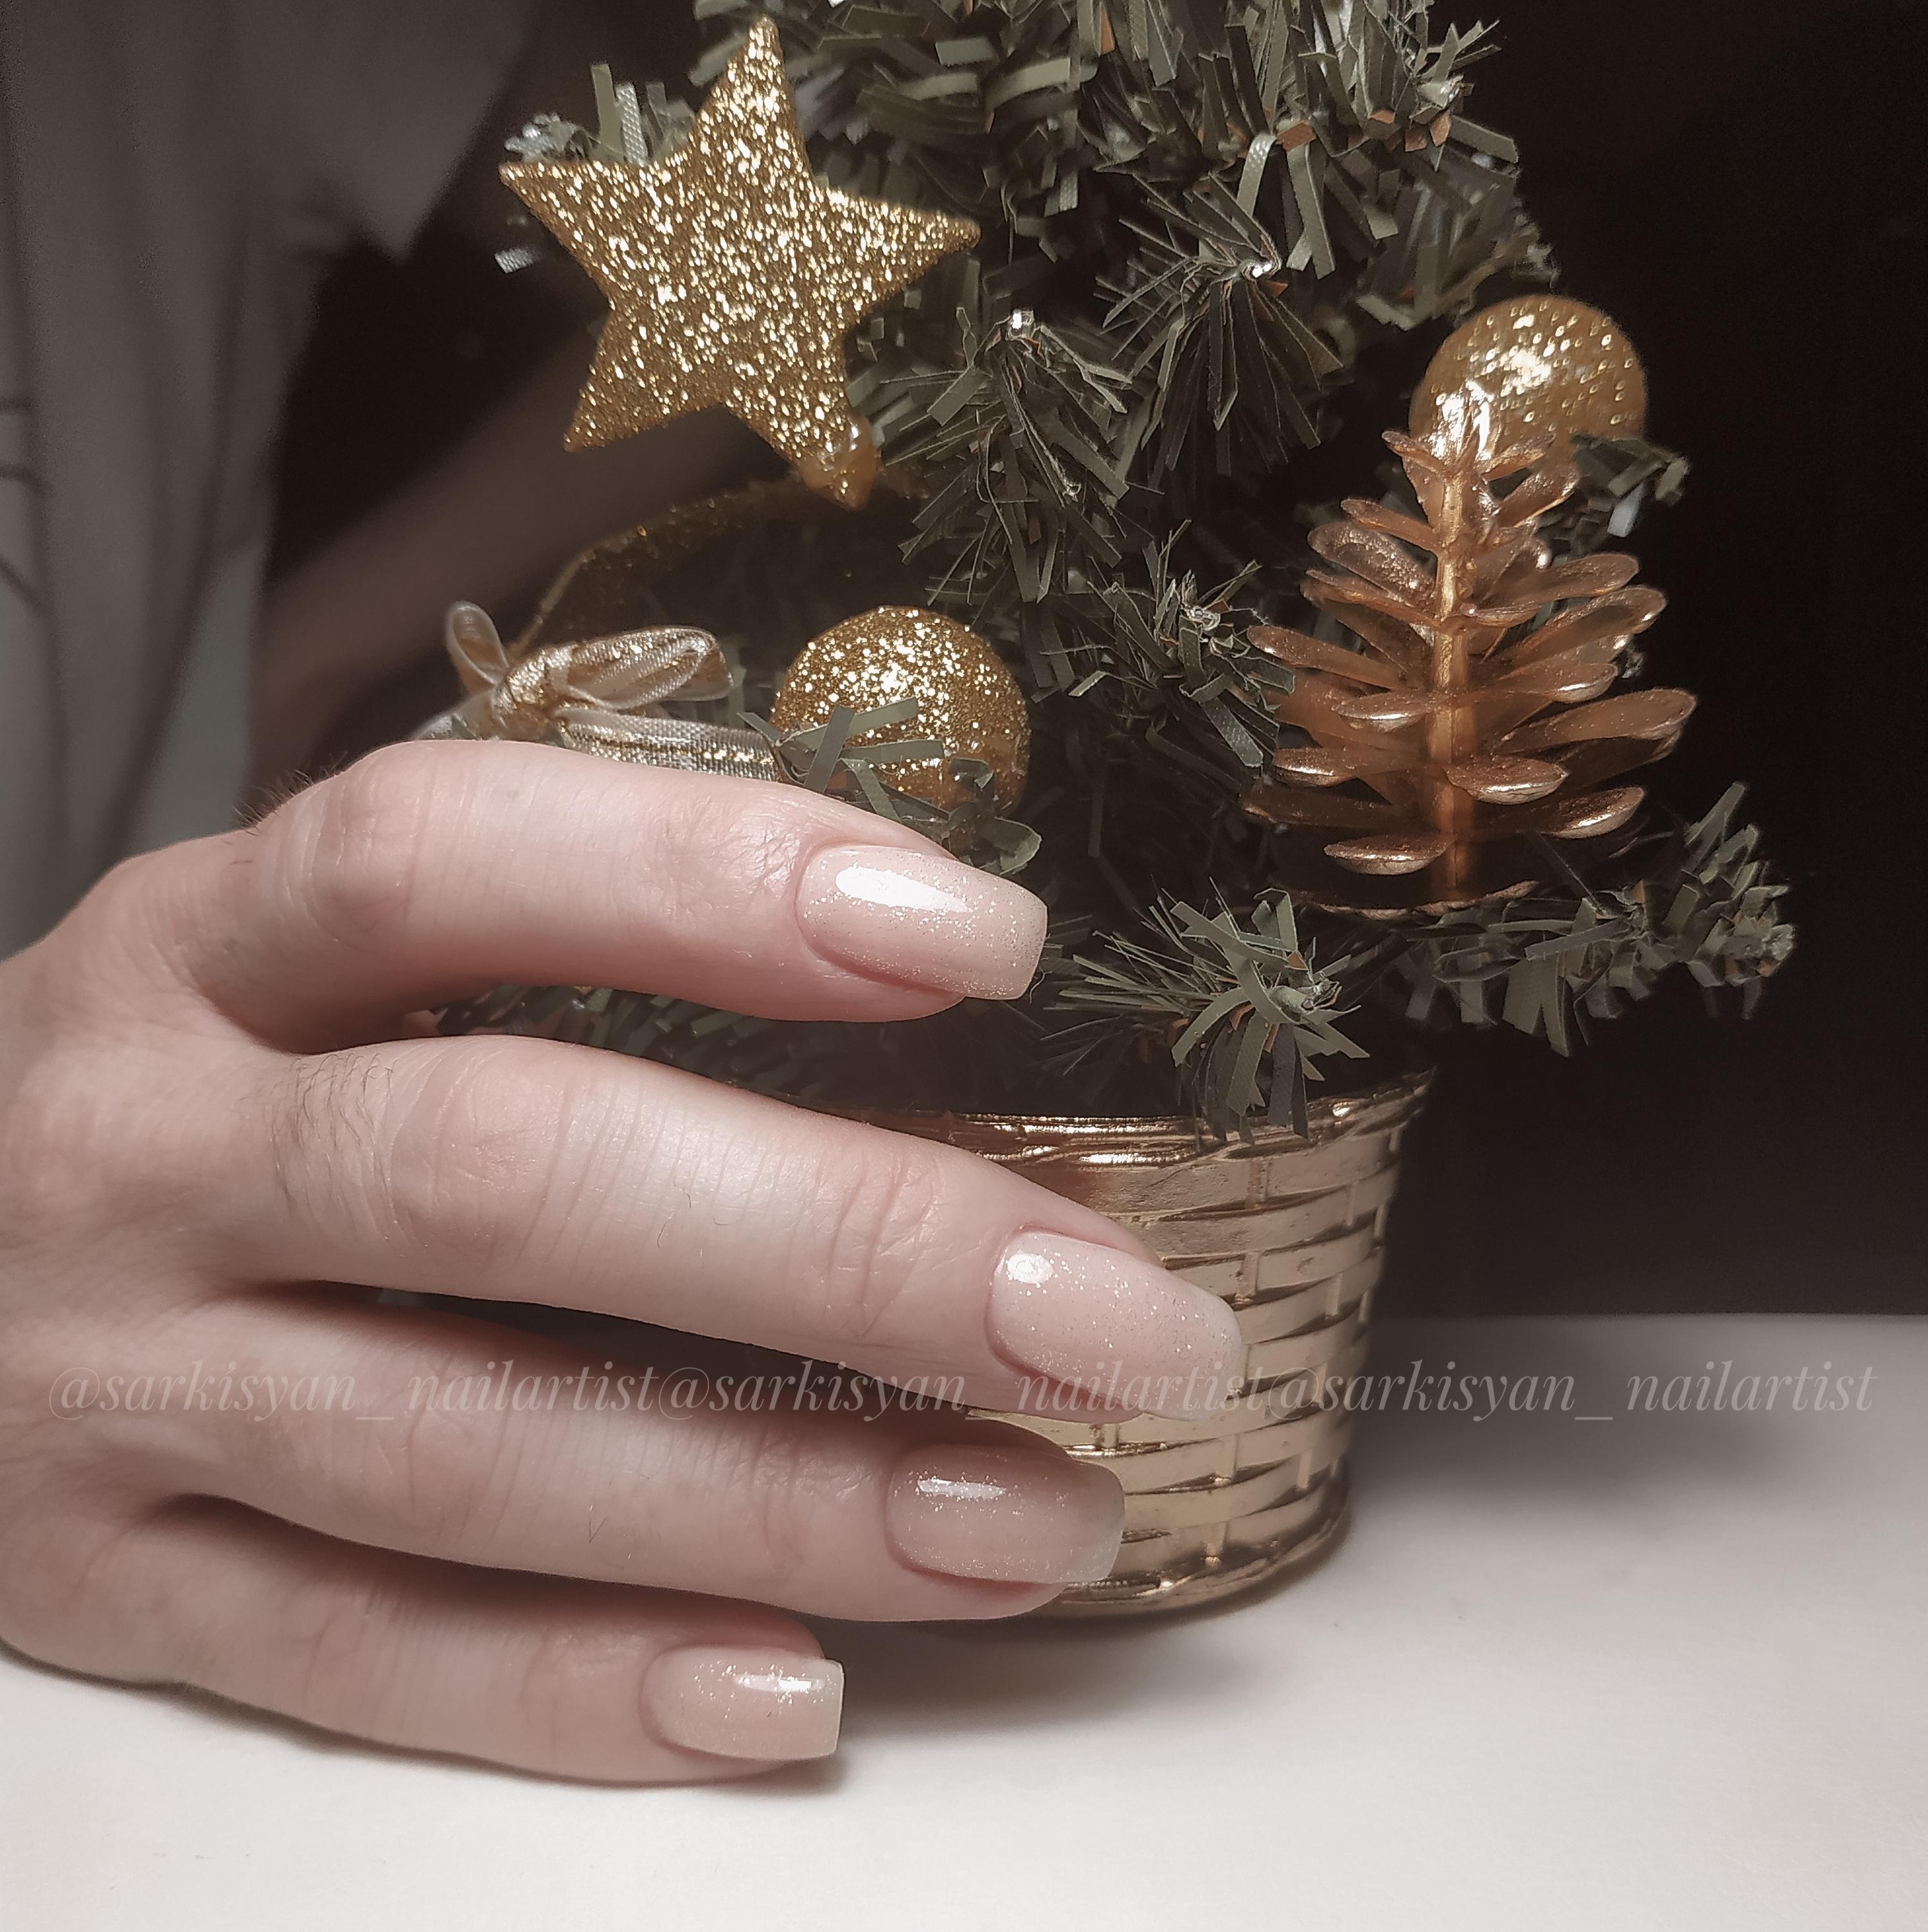 Аппаратный маникюр, база bloom 5, grattol opal 01